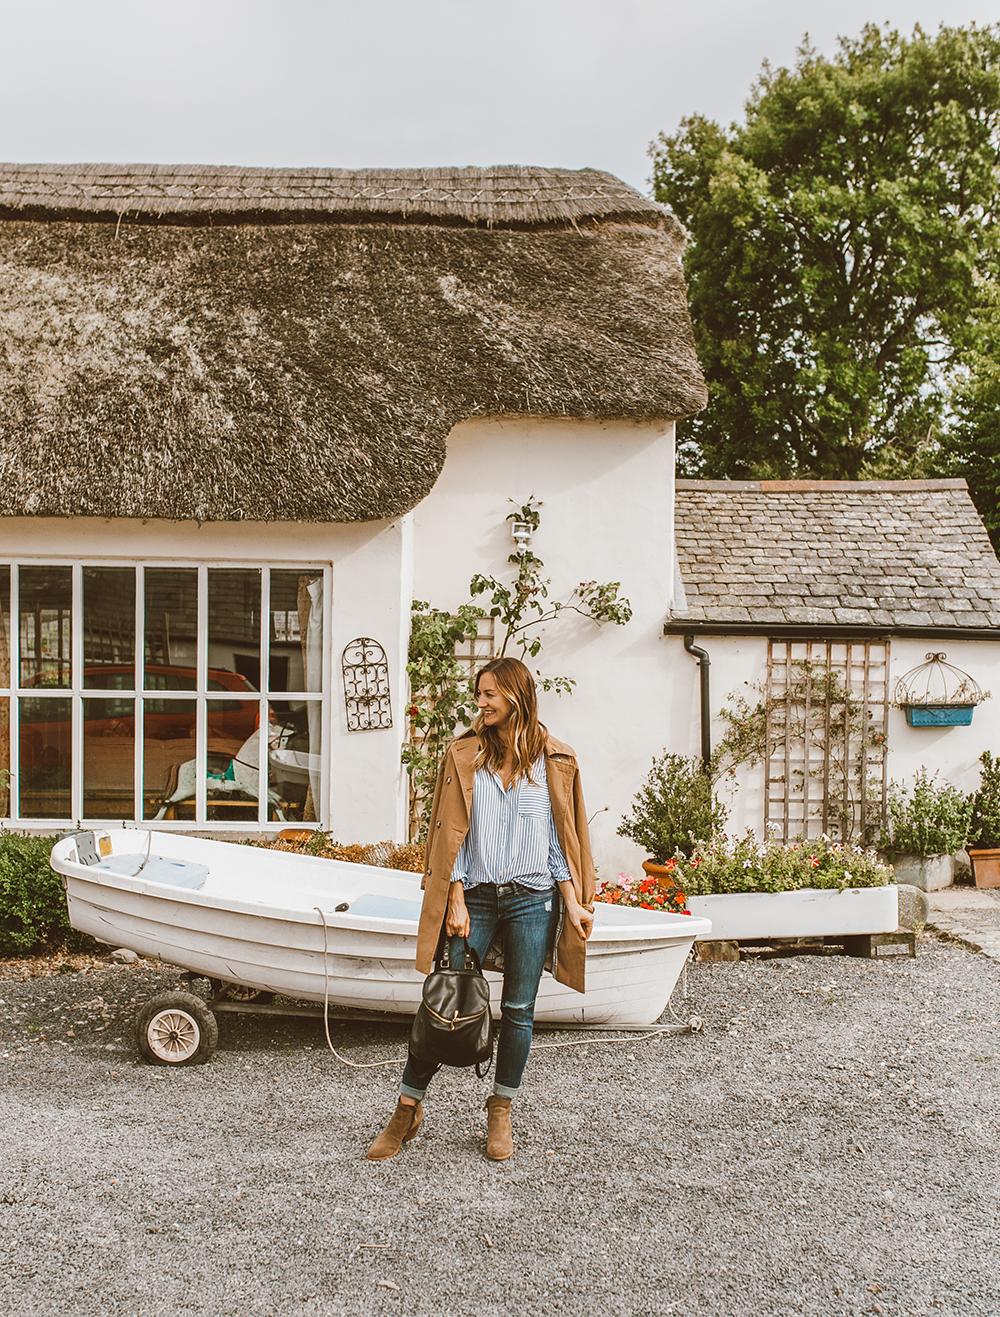 livvyland-blog-olivia-watson-british-isles-cruise-belfast-2